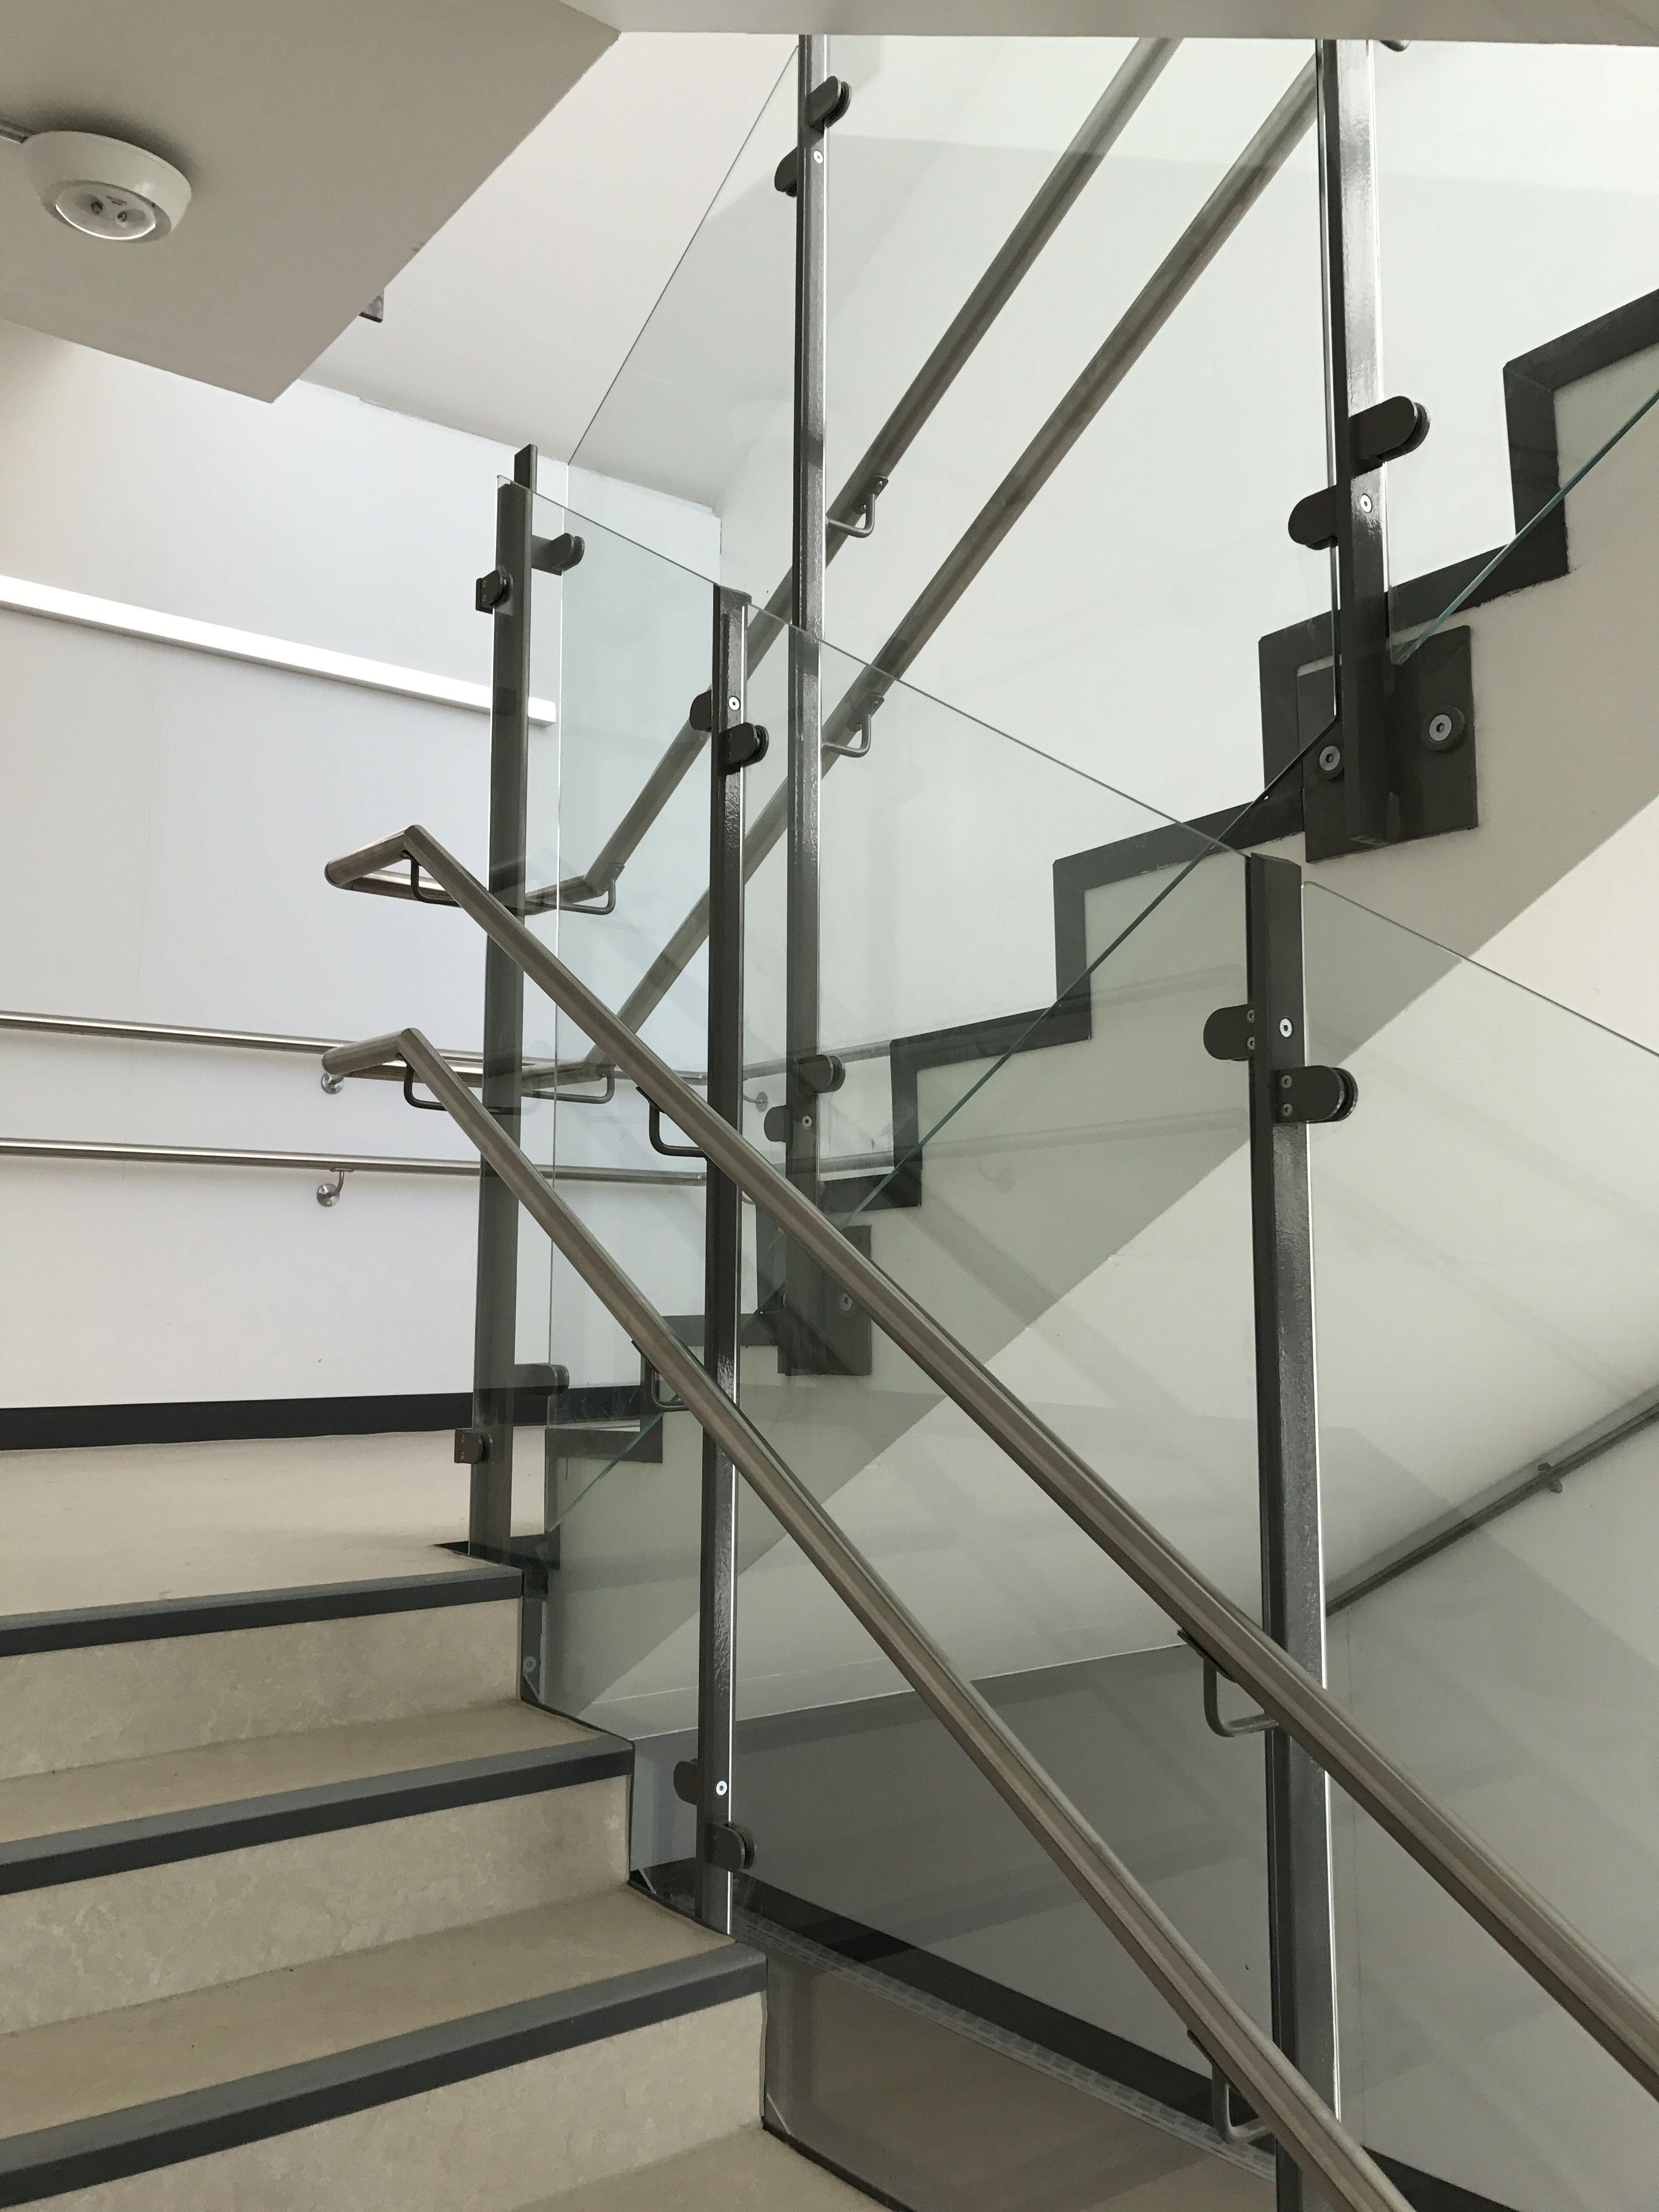 Twin rail staircase balustrade design idea.